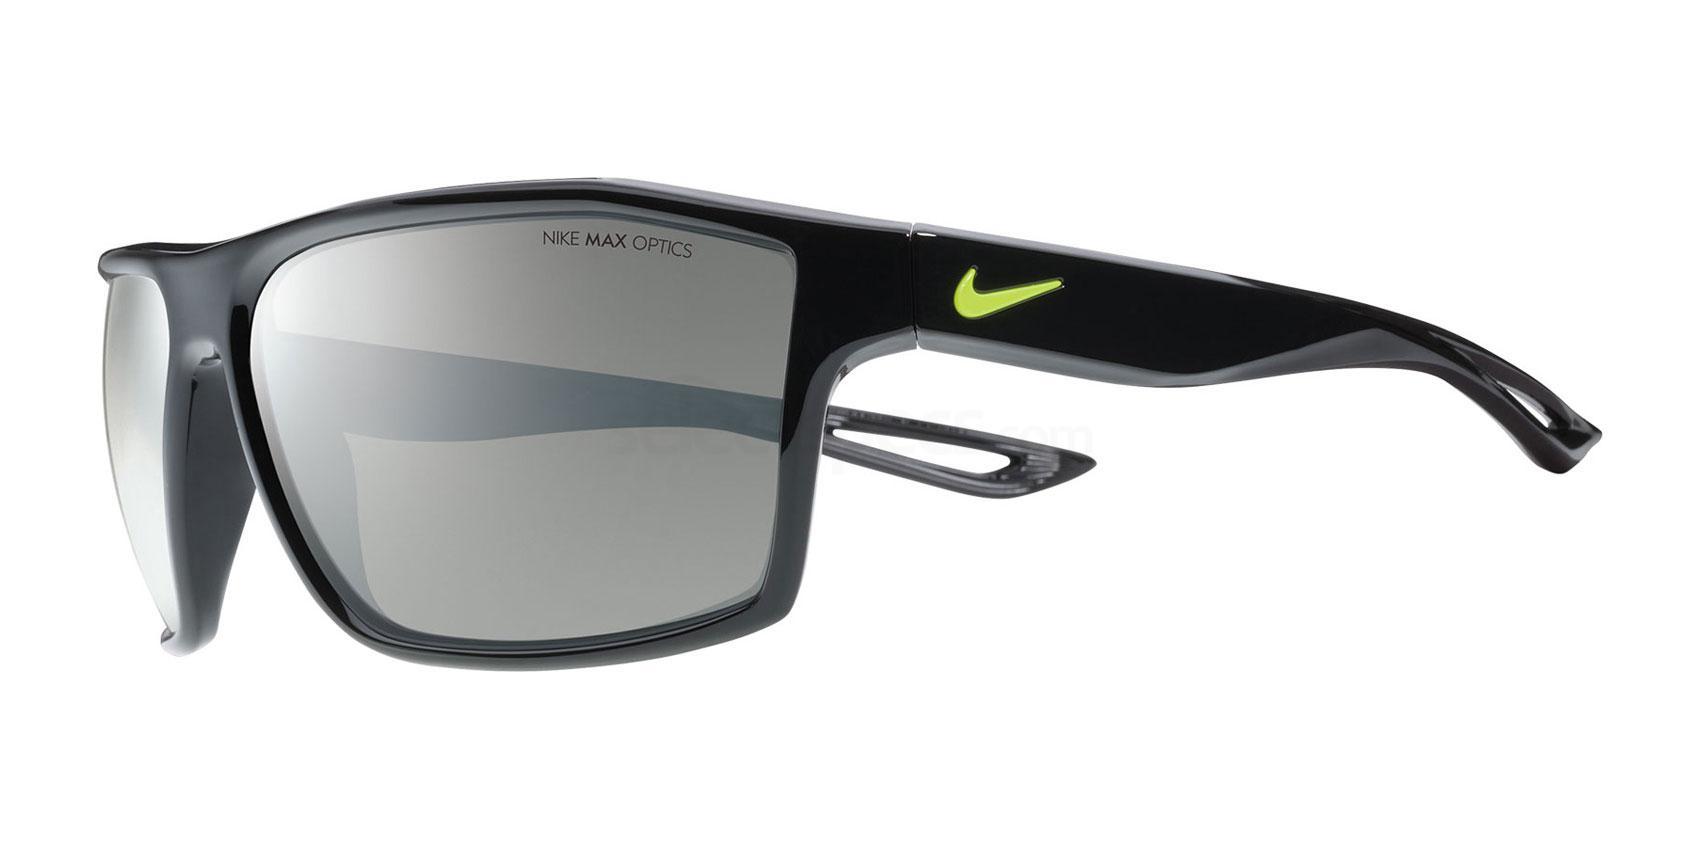 001 LEGEND EV0940 Sunglasses, Nike